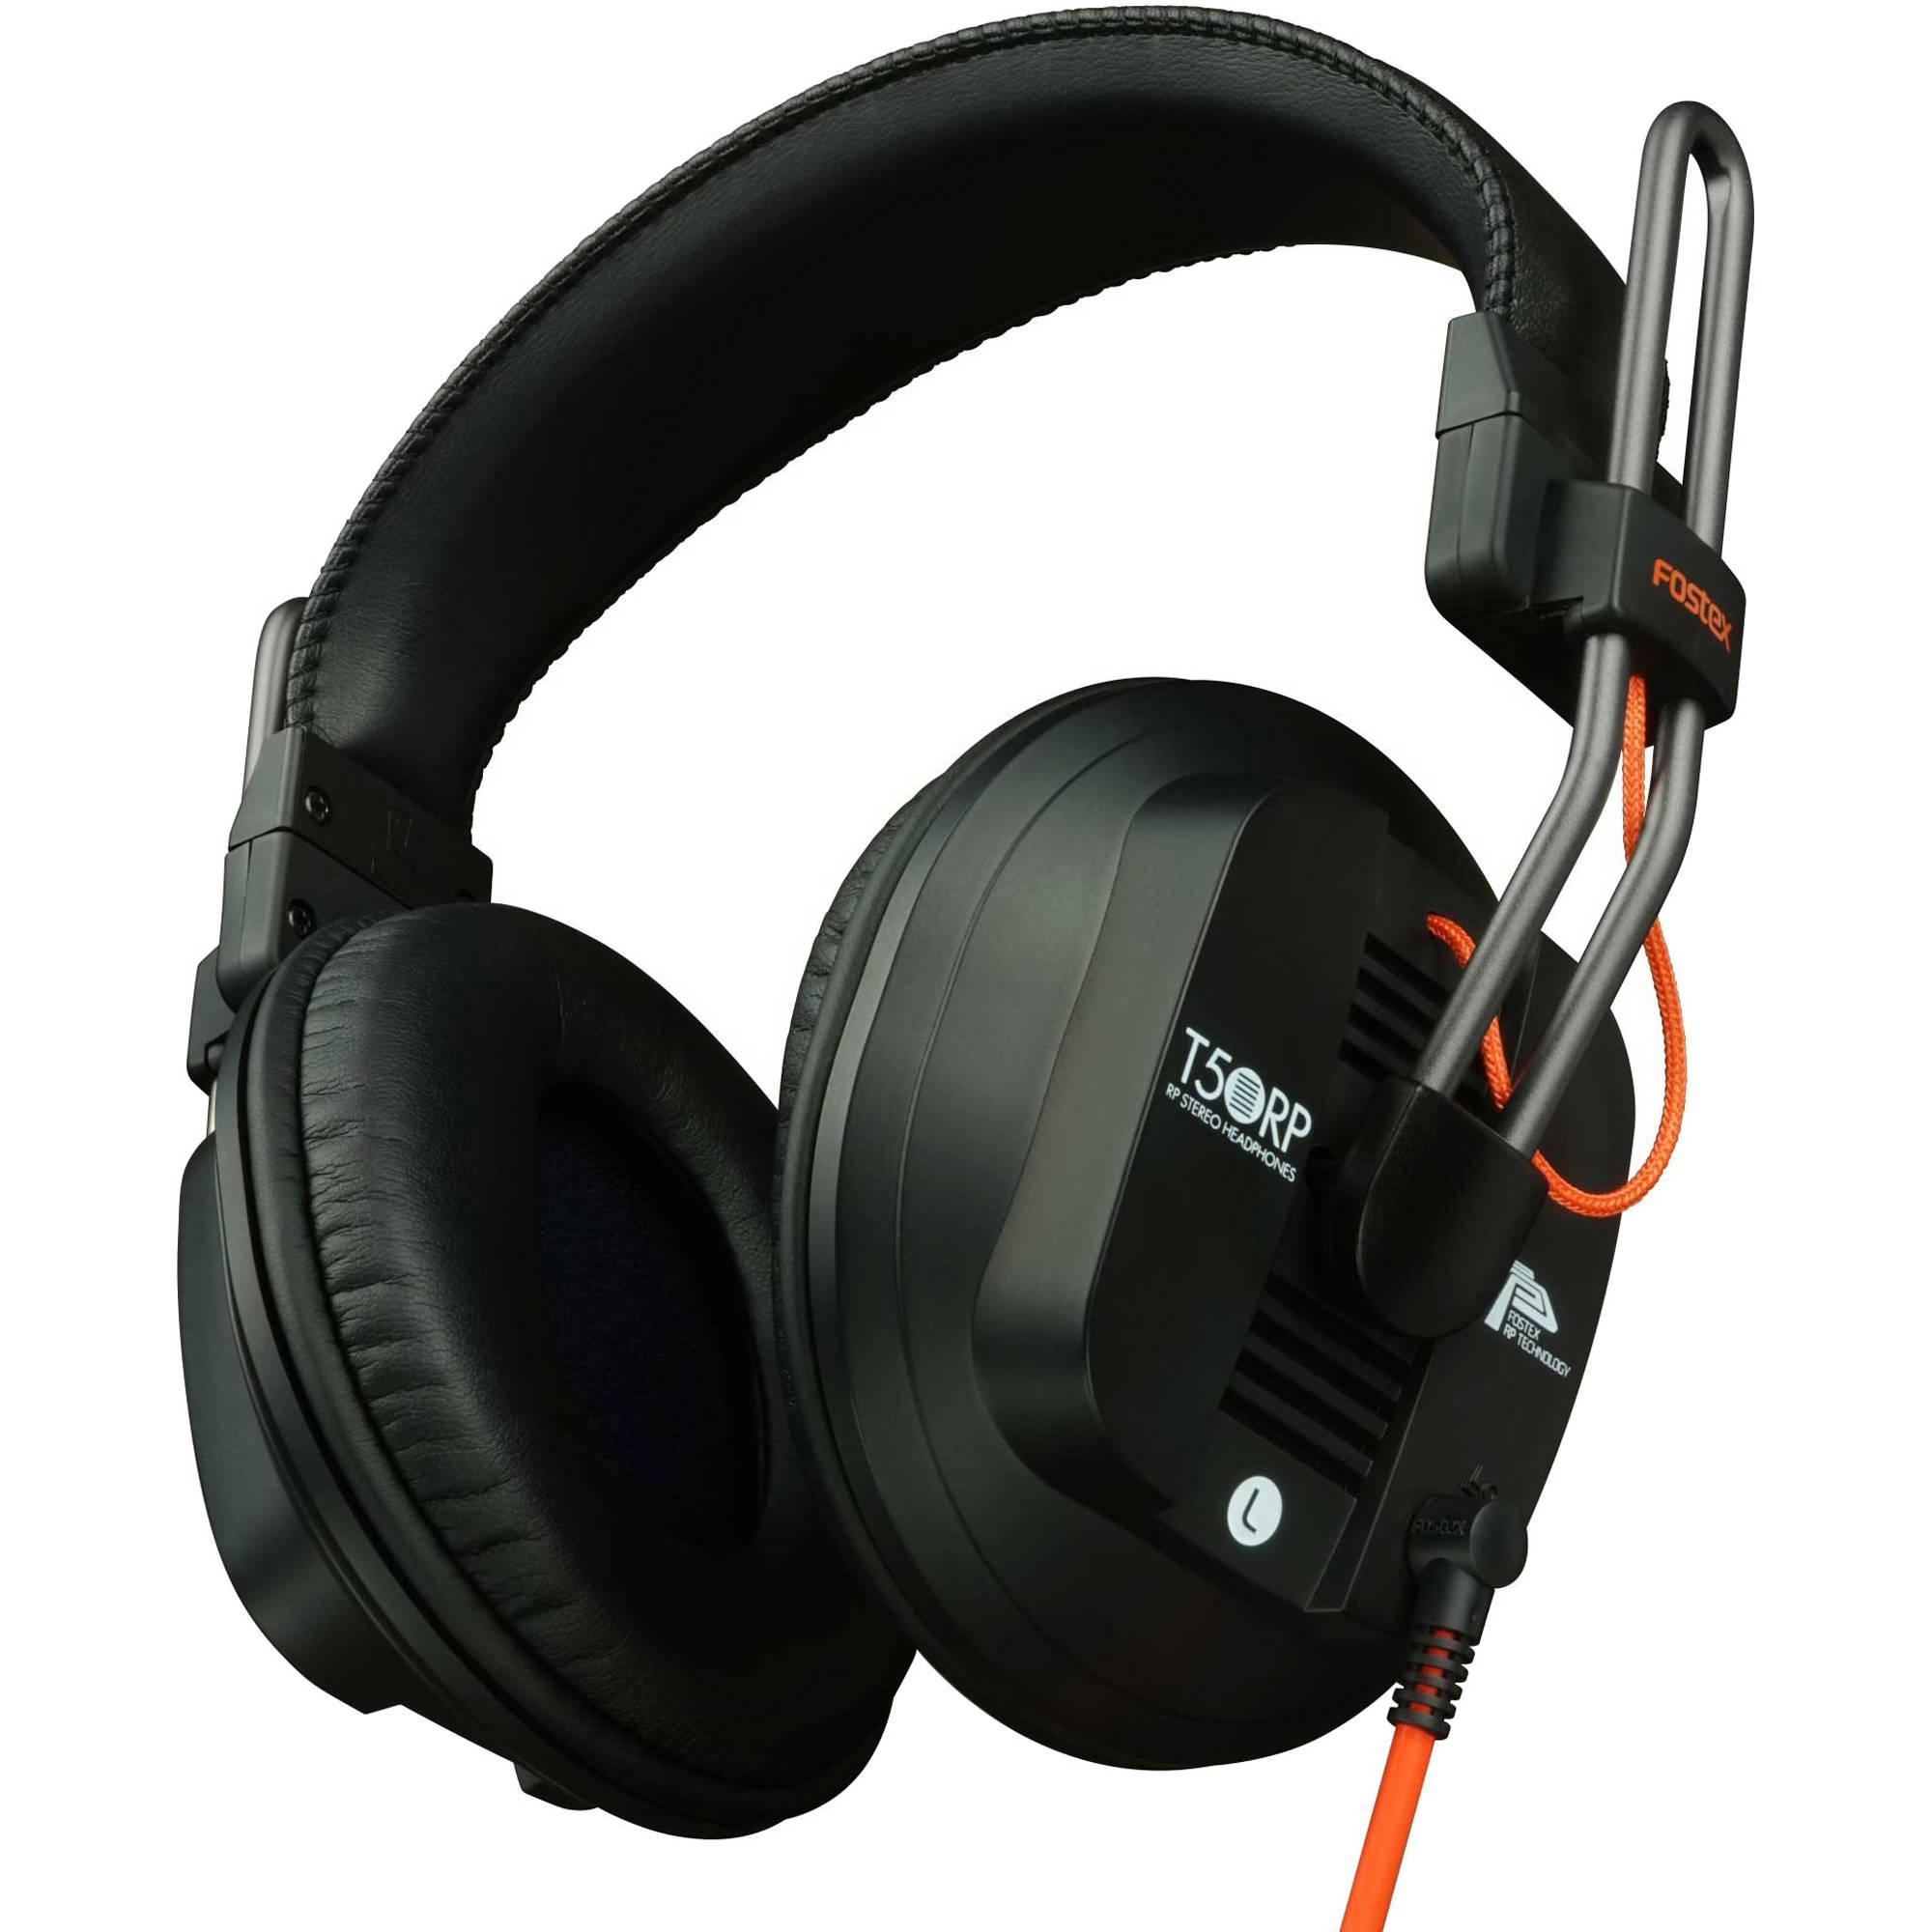 fostex_rpmk3_series_t50rp_mk3_stereo_1180066